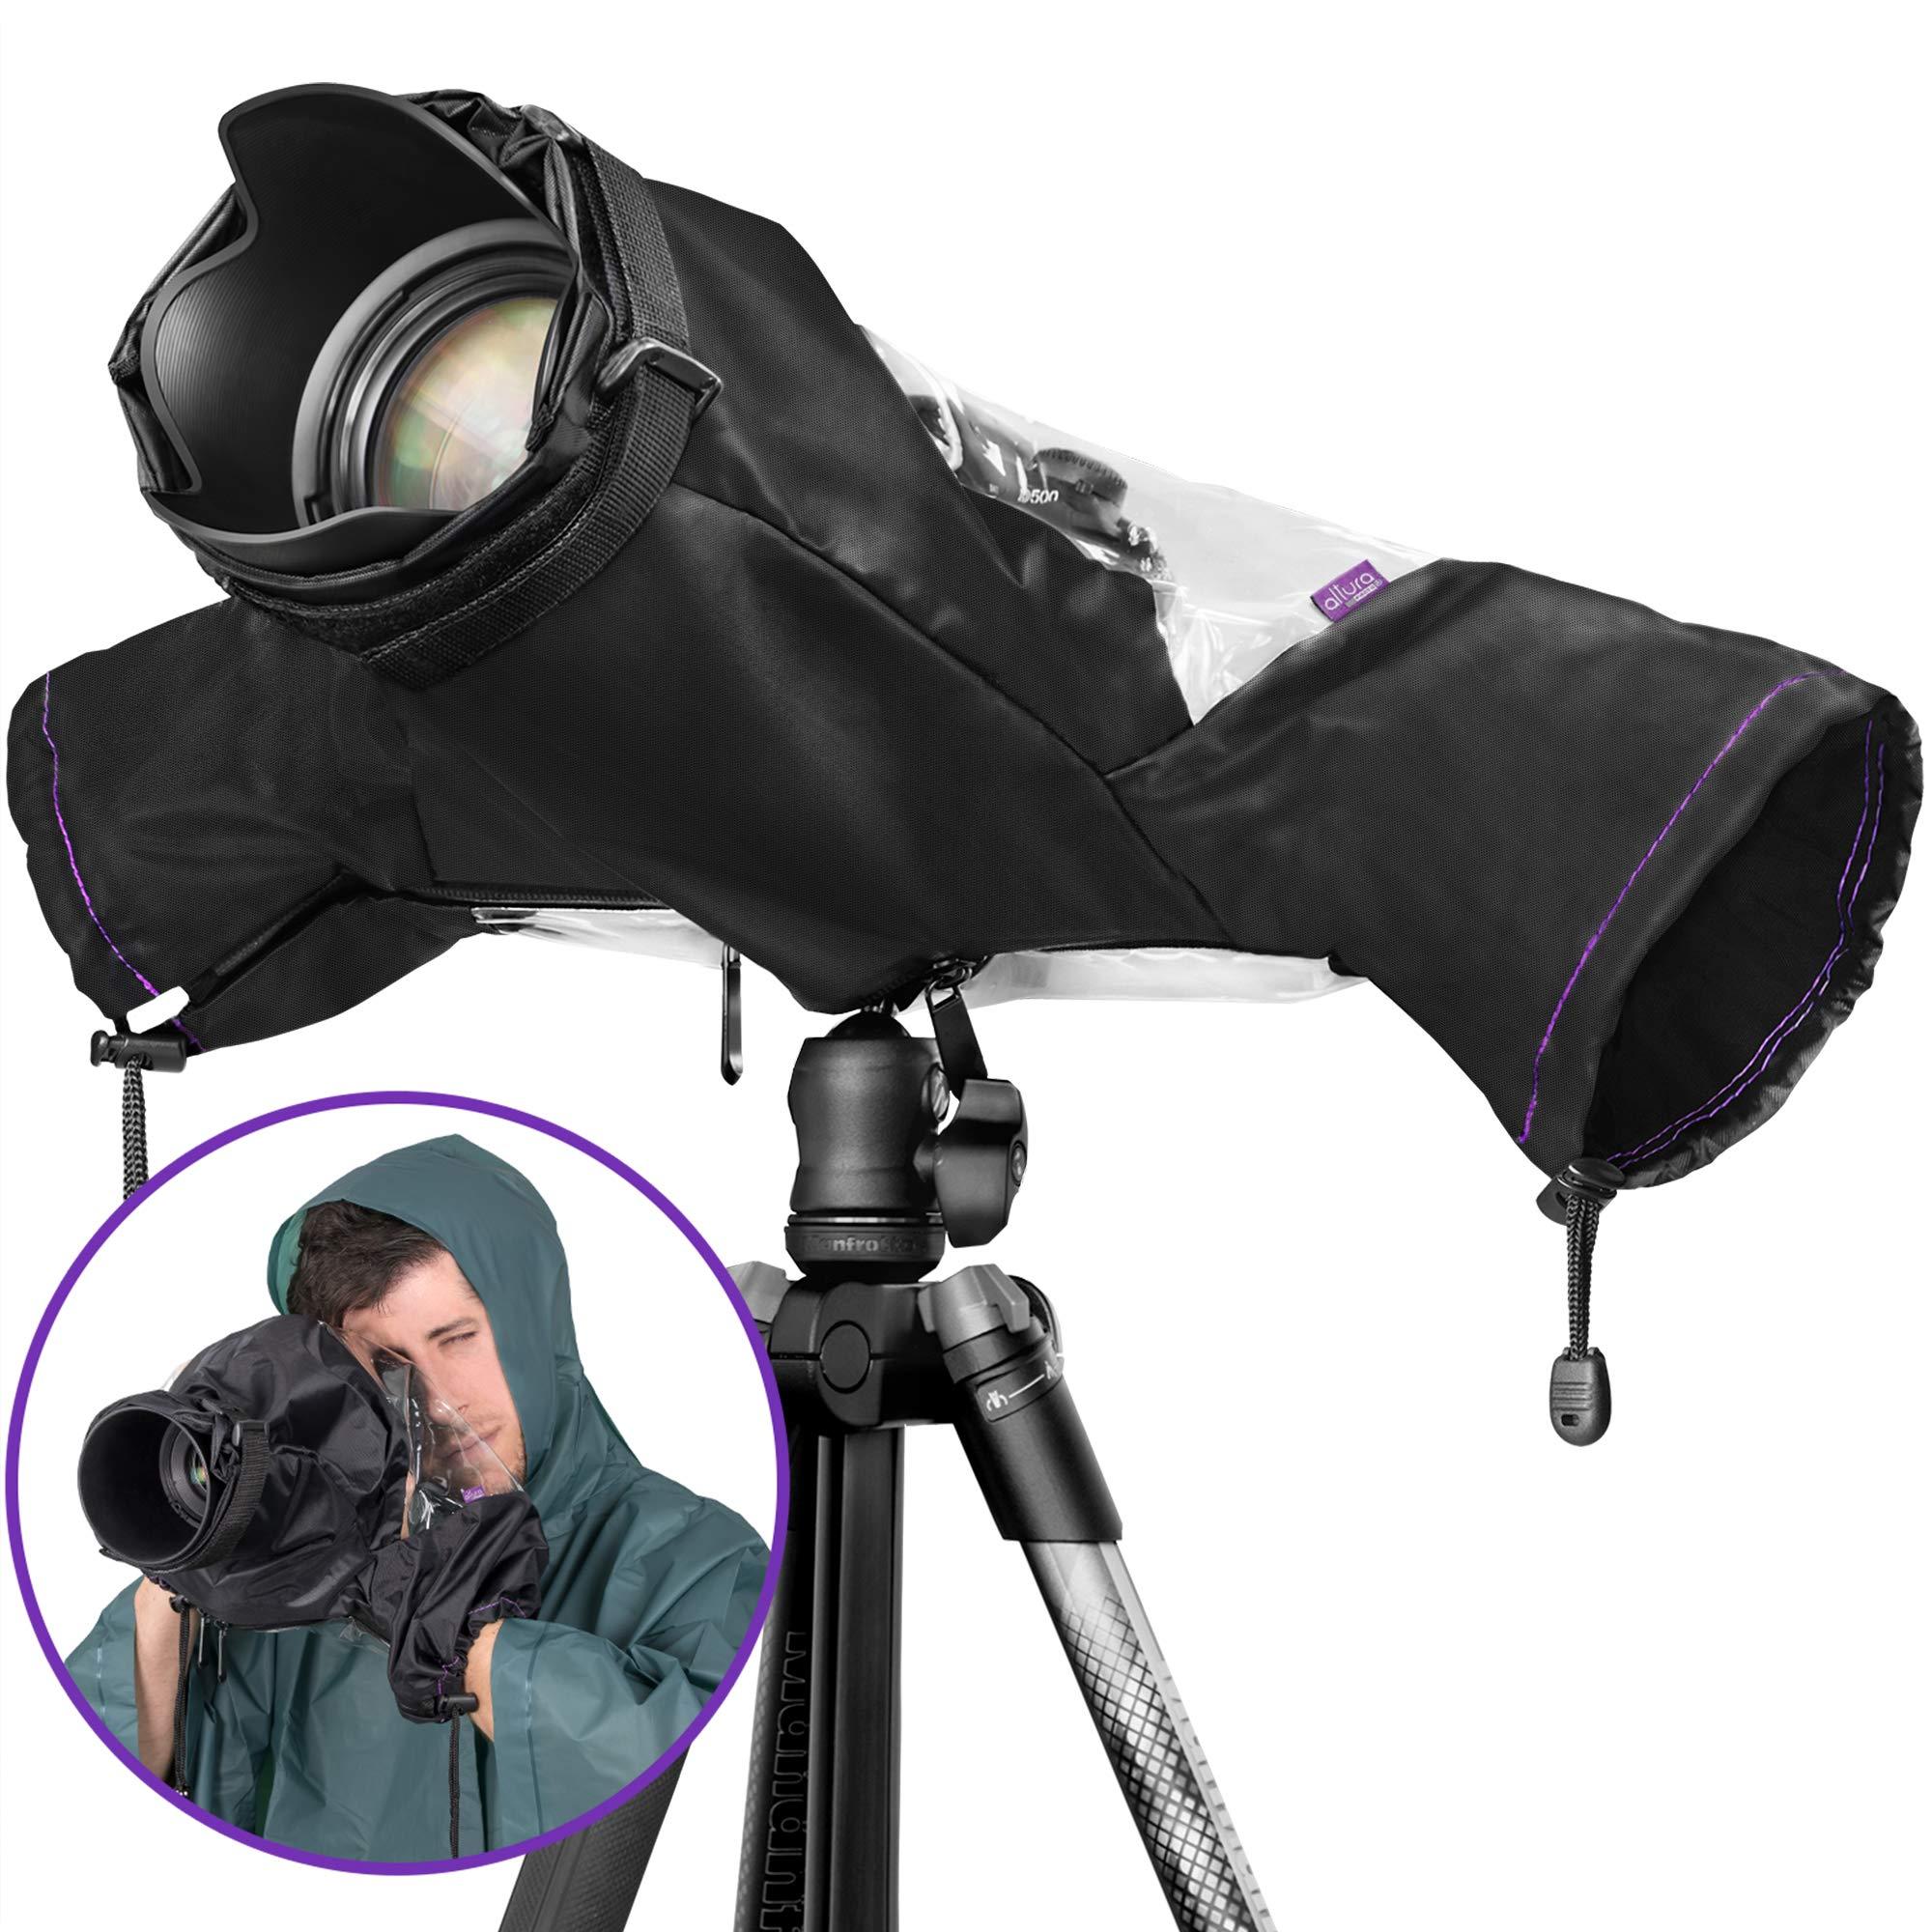 Altura Photo Professional Rain Cover for Large Canon Nikon DSLR Cameras by Altura Photo